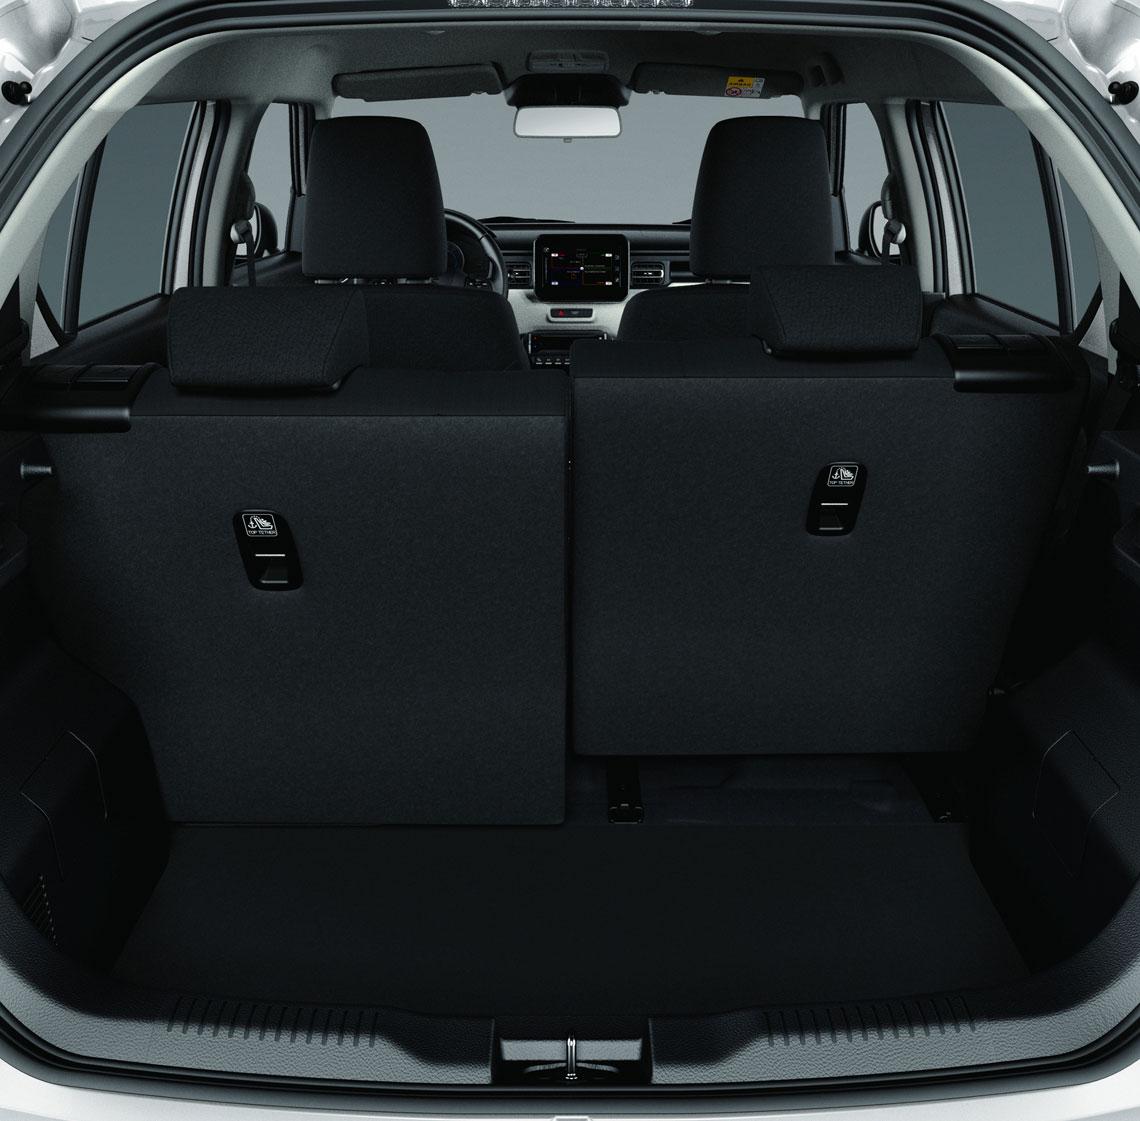 Suzuki Ignis 2017 - багажник